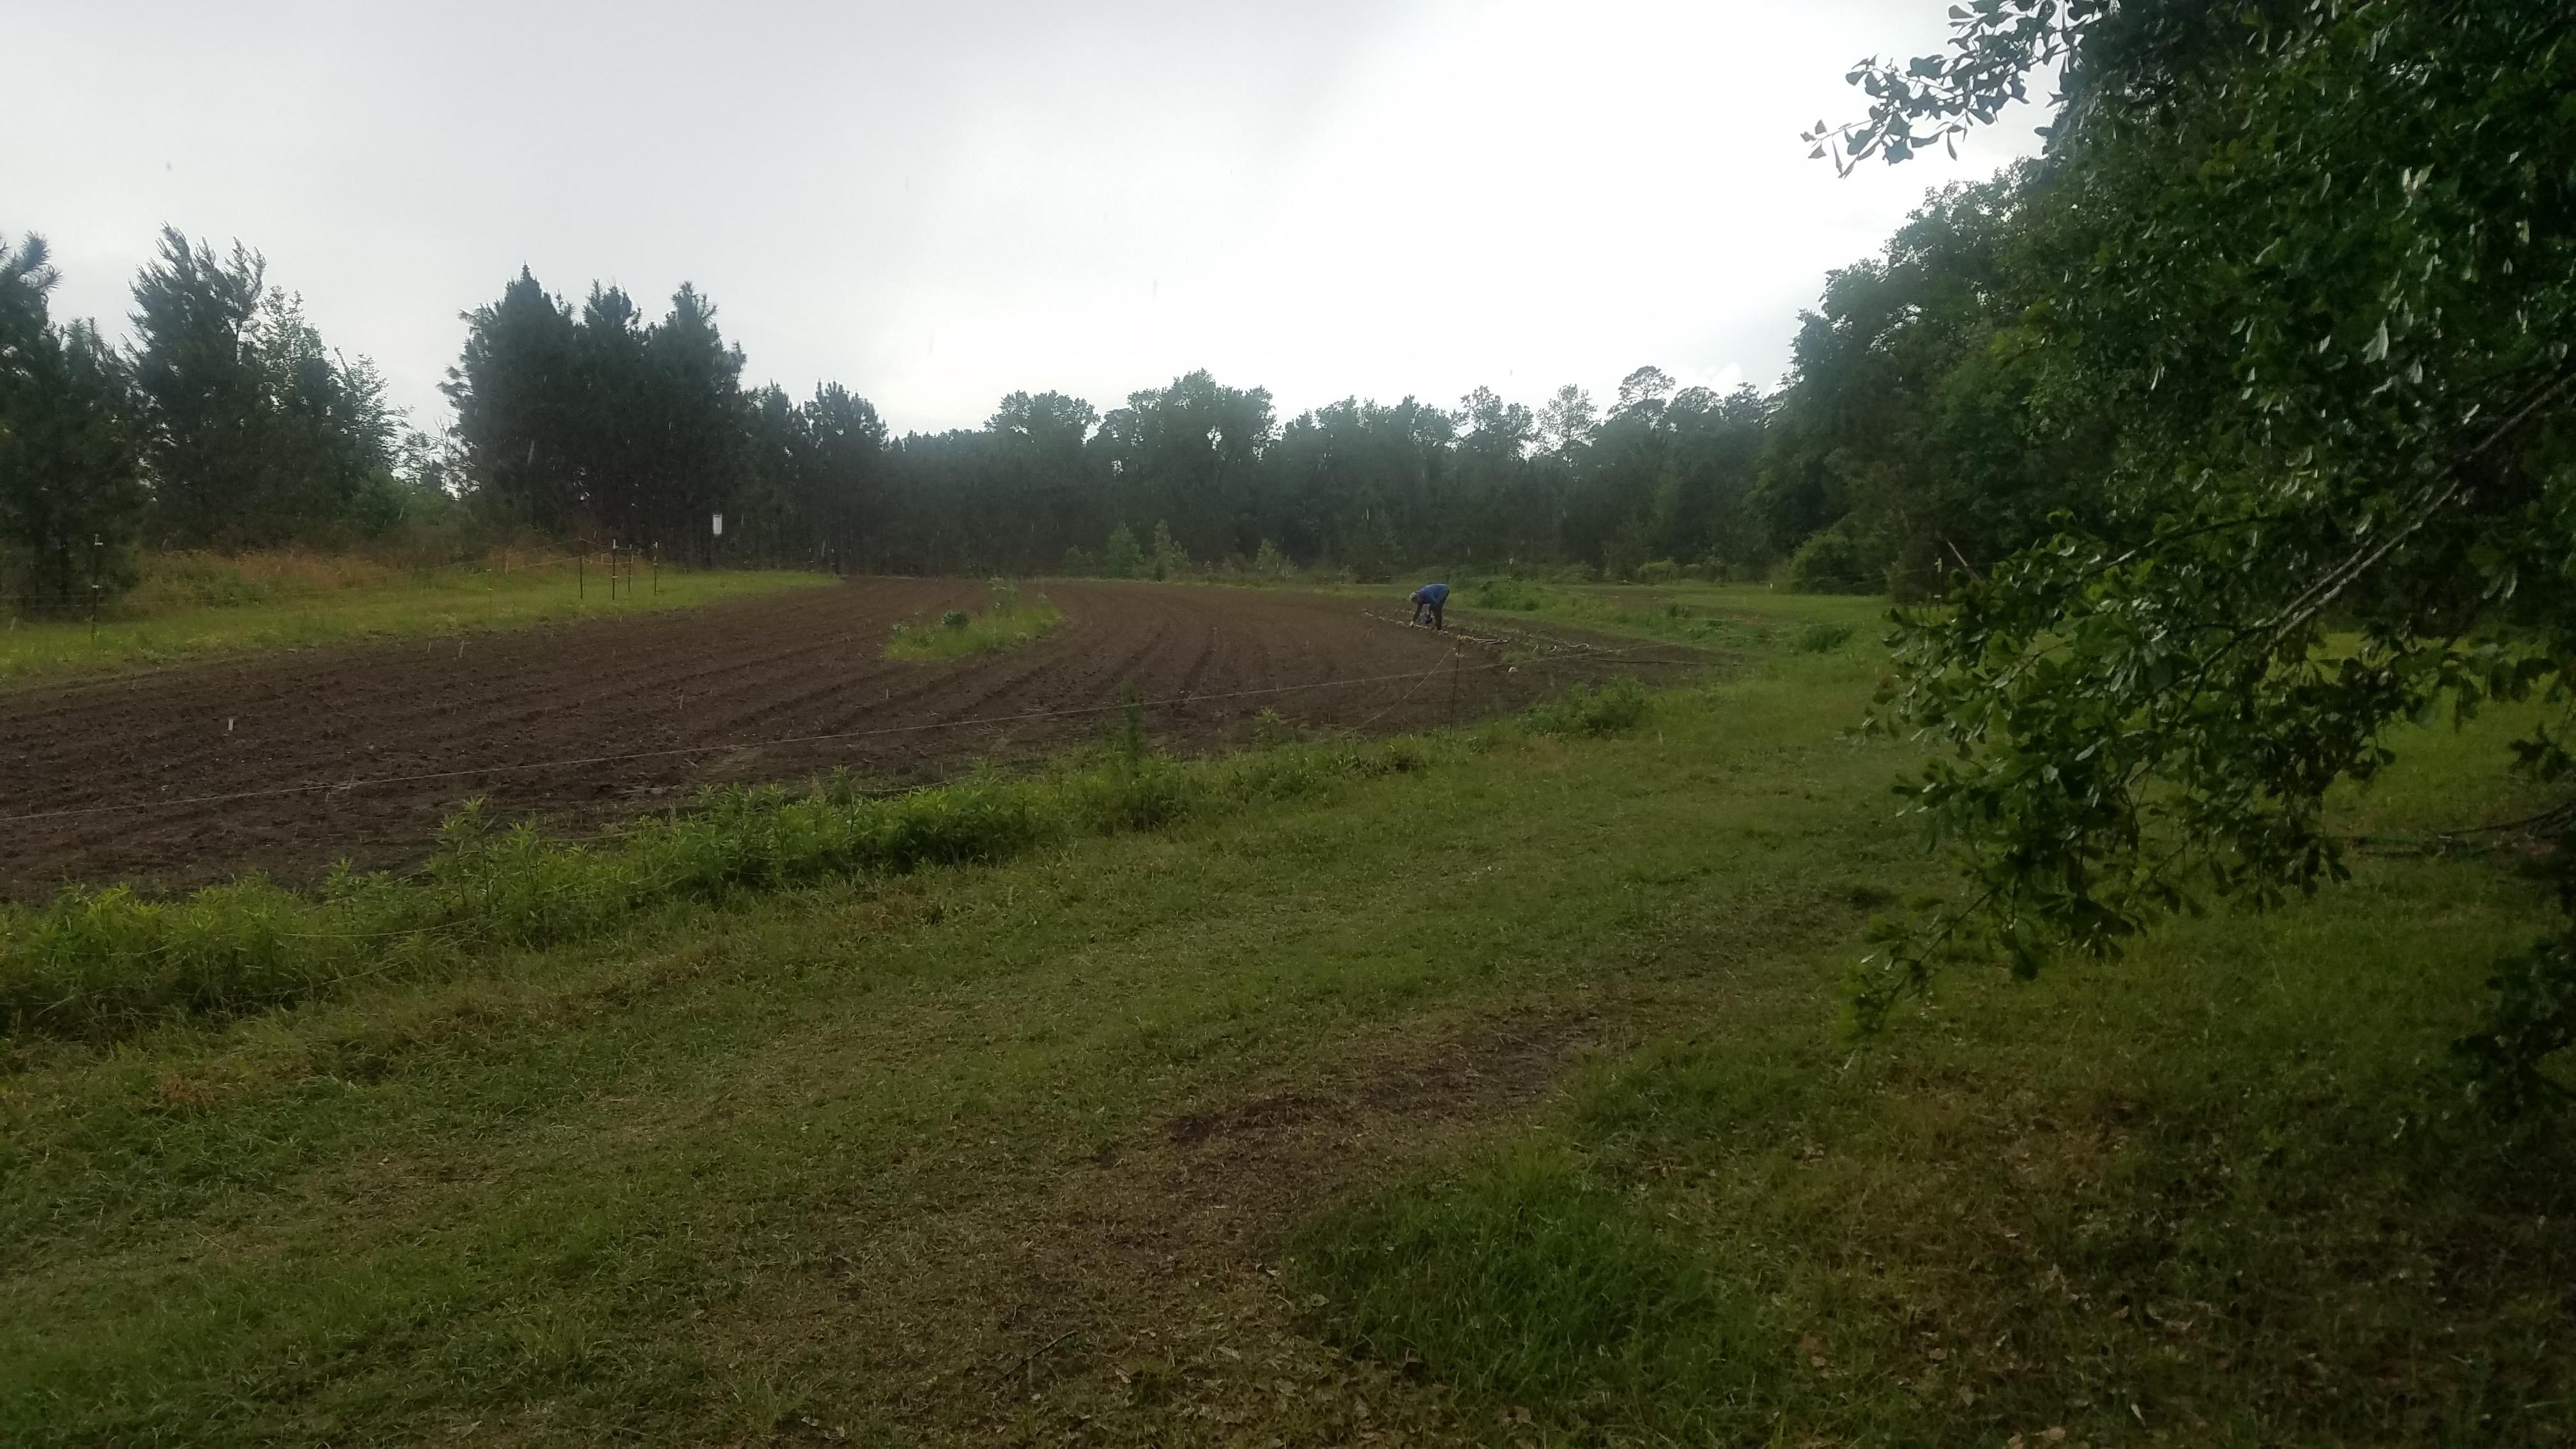 4032x2268 Precise application, Rain, in Planting Garden, by John S. Quarterman, for OkraParadise.com, 8 April 2019